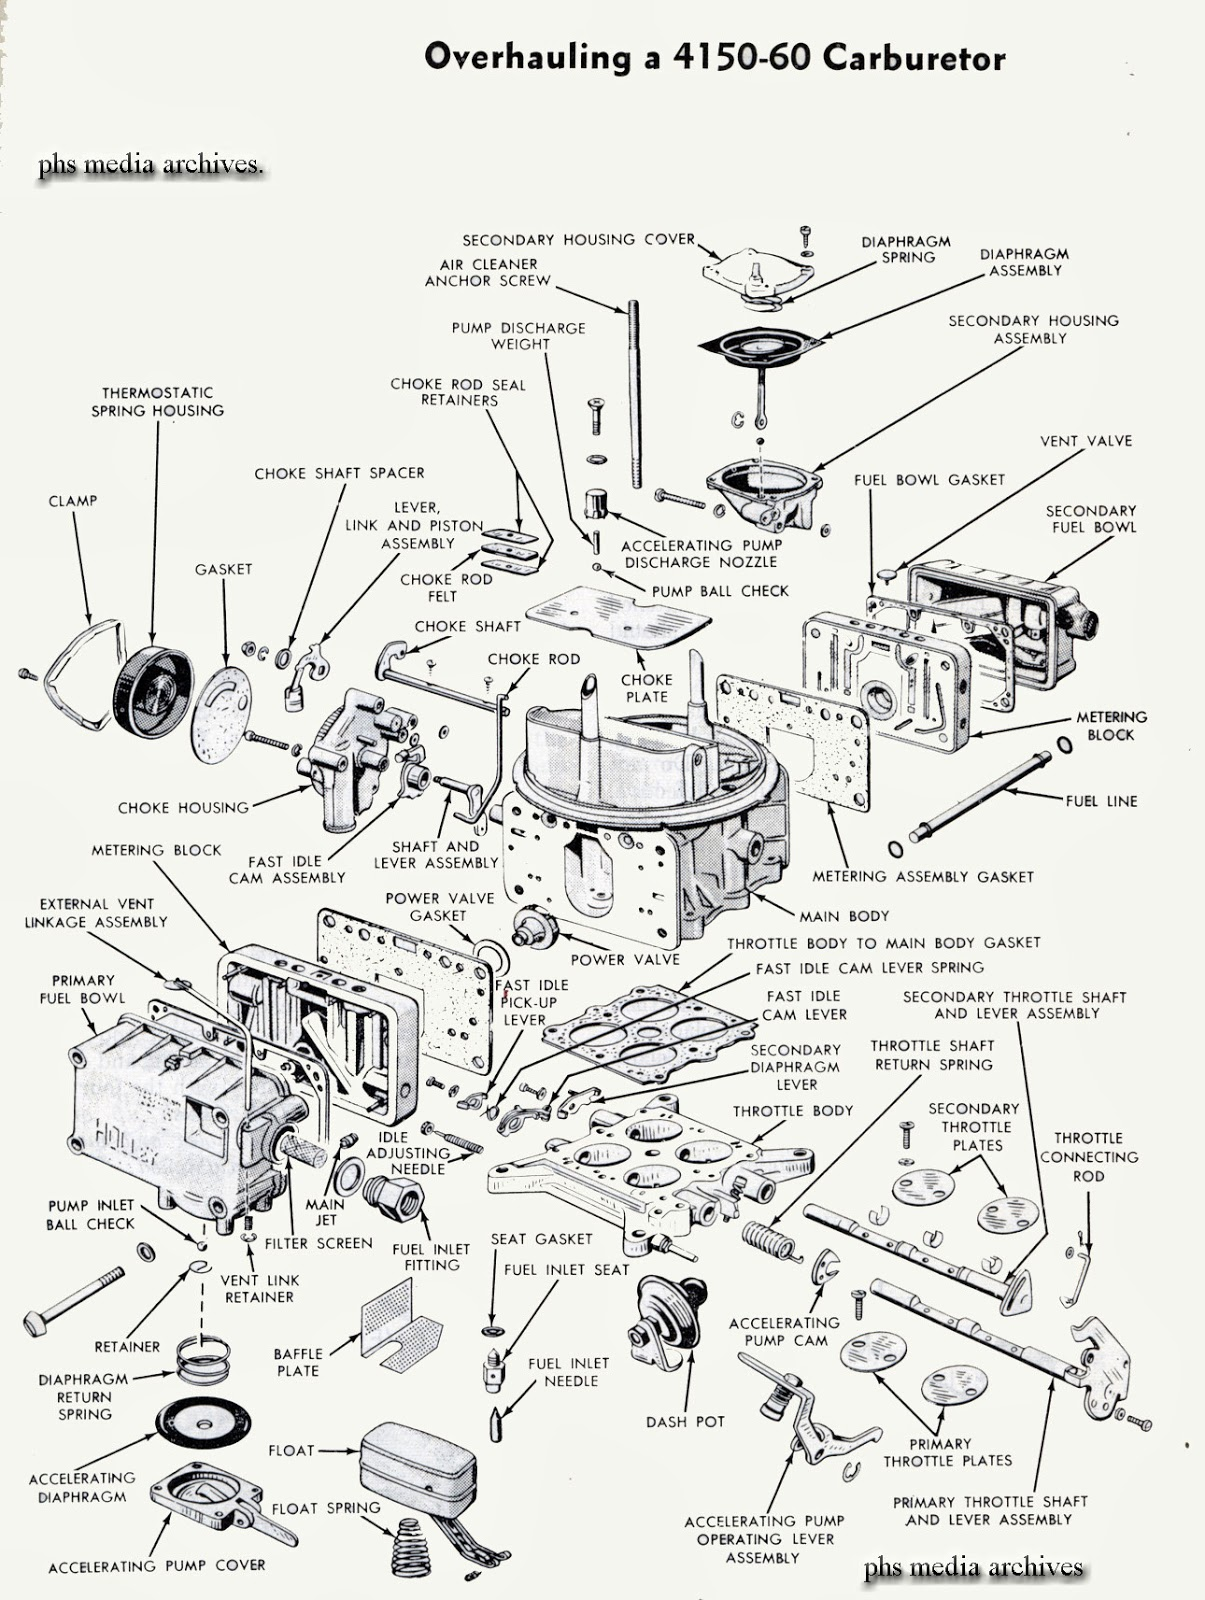 vacuum hose diagram moreover holley 2 barrel carburetor diagram terrain also holley carb vacuum port diagram [ 1205 x 1600 Pixel ]